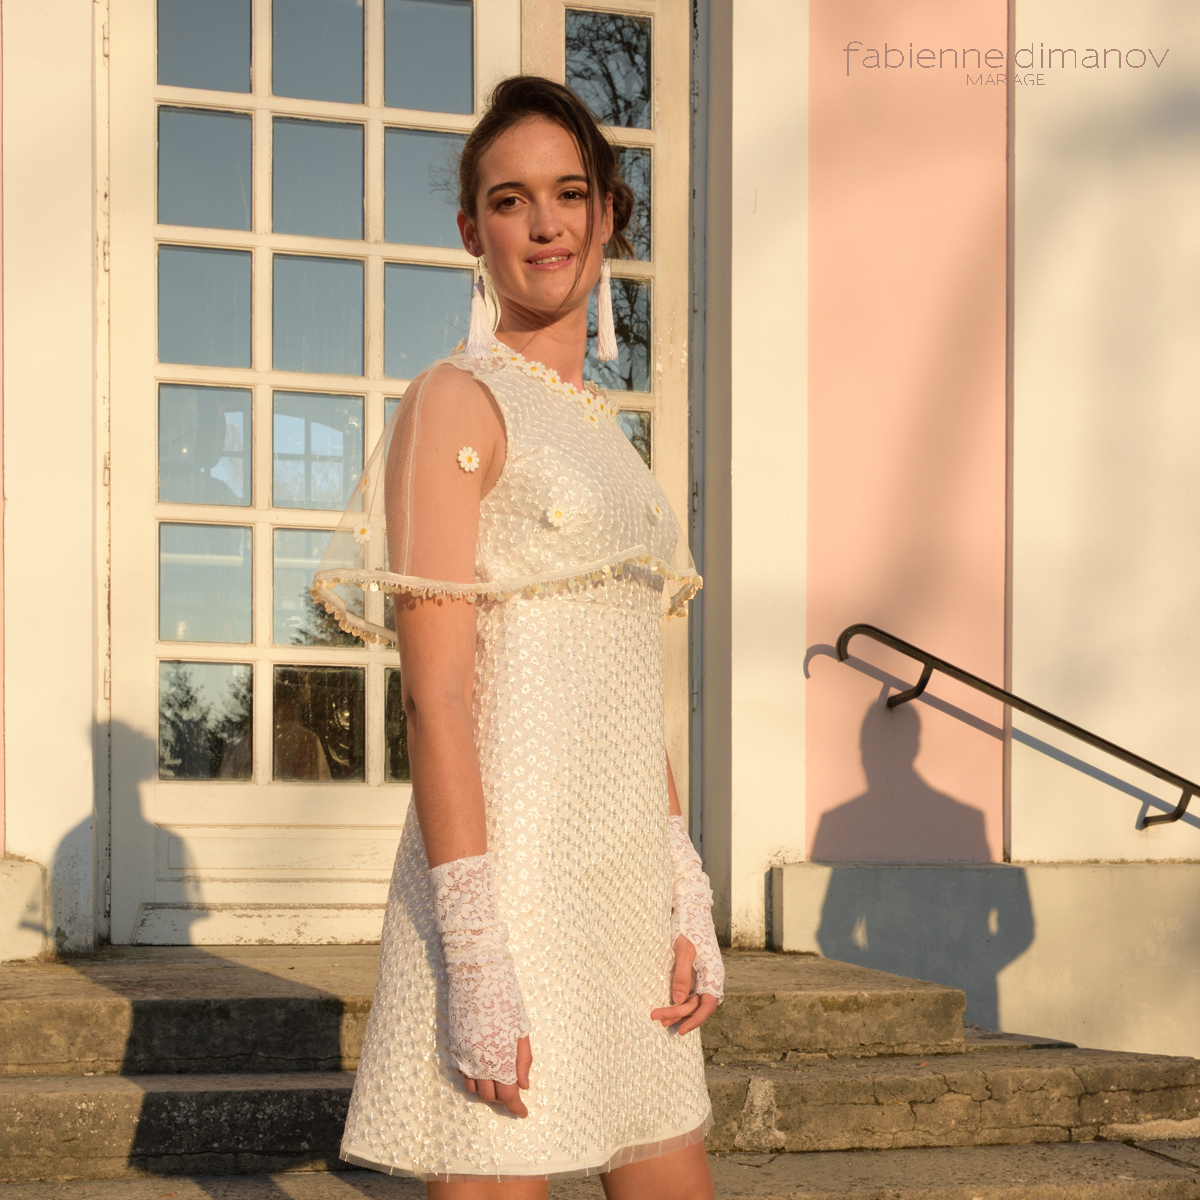 Daisy - Miss Fab - Fabienne Dimanov Paris